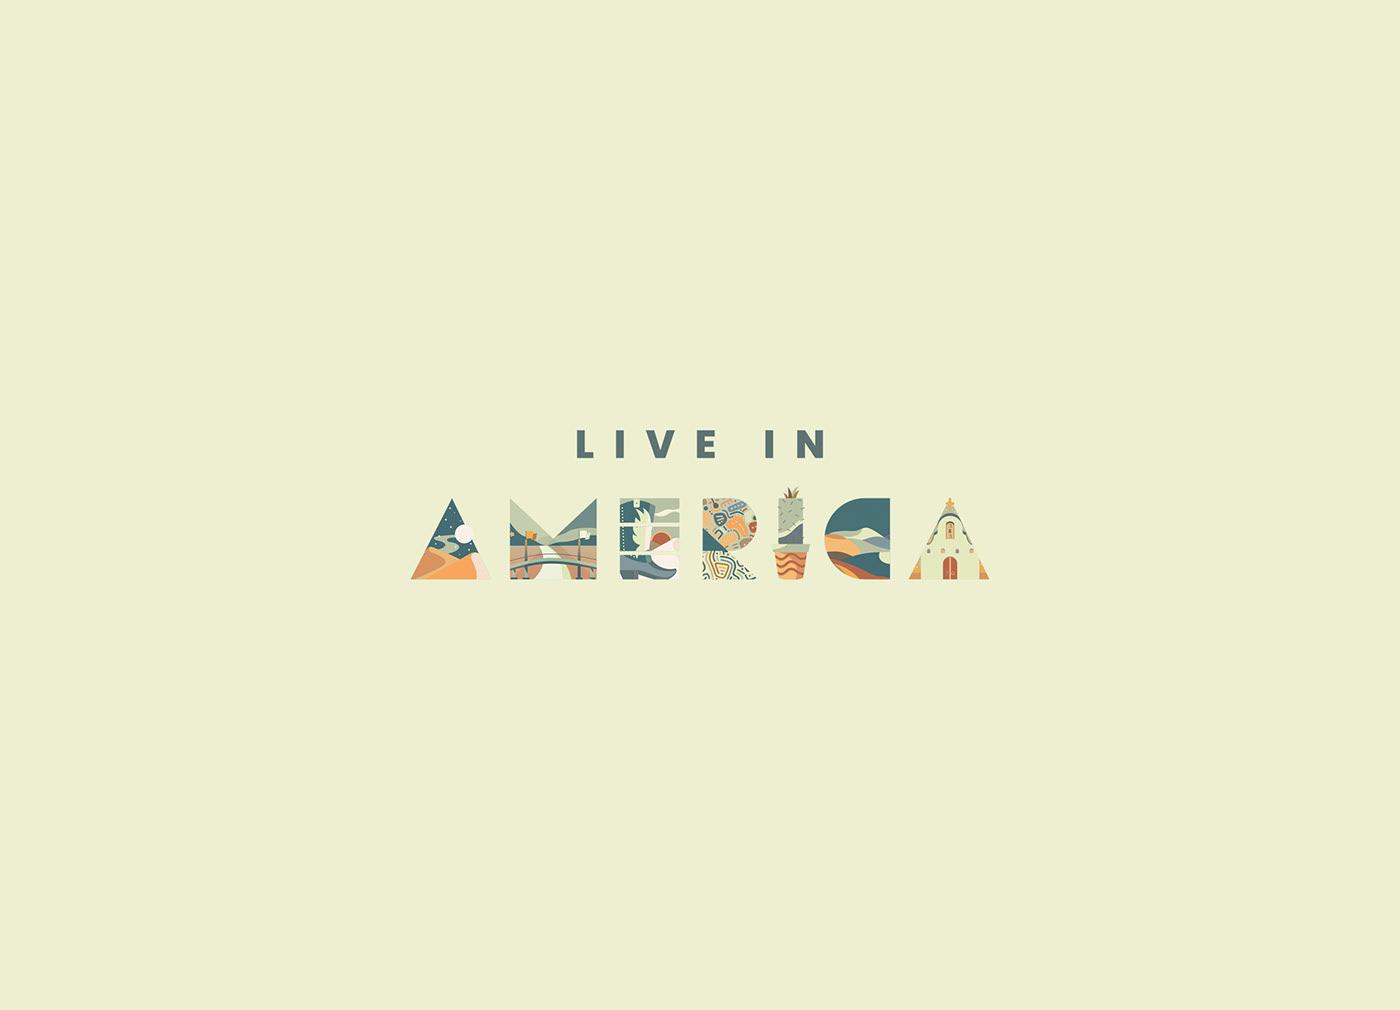 el paso live in america logo